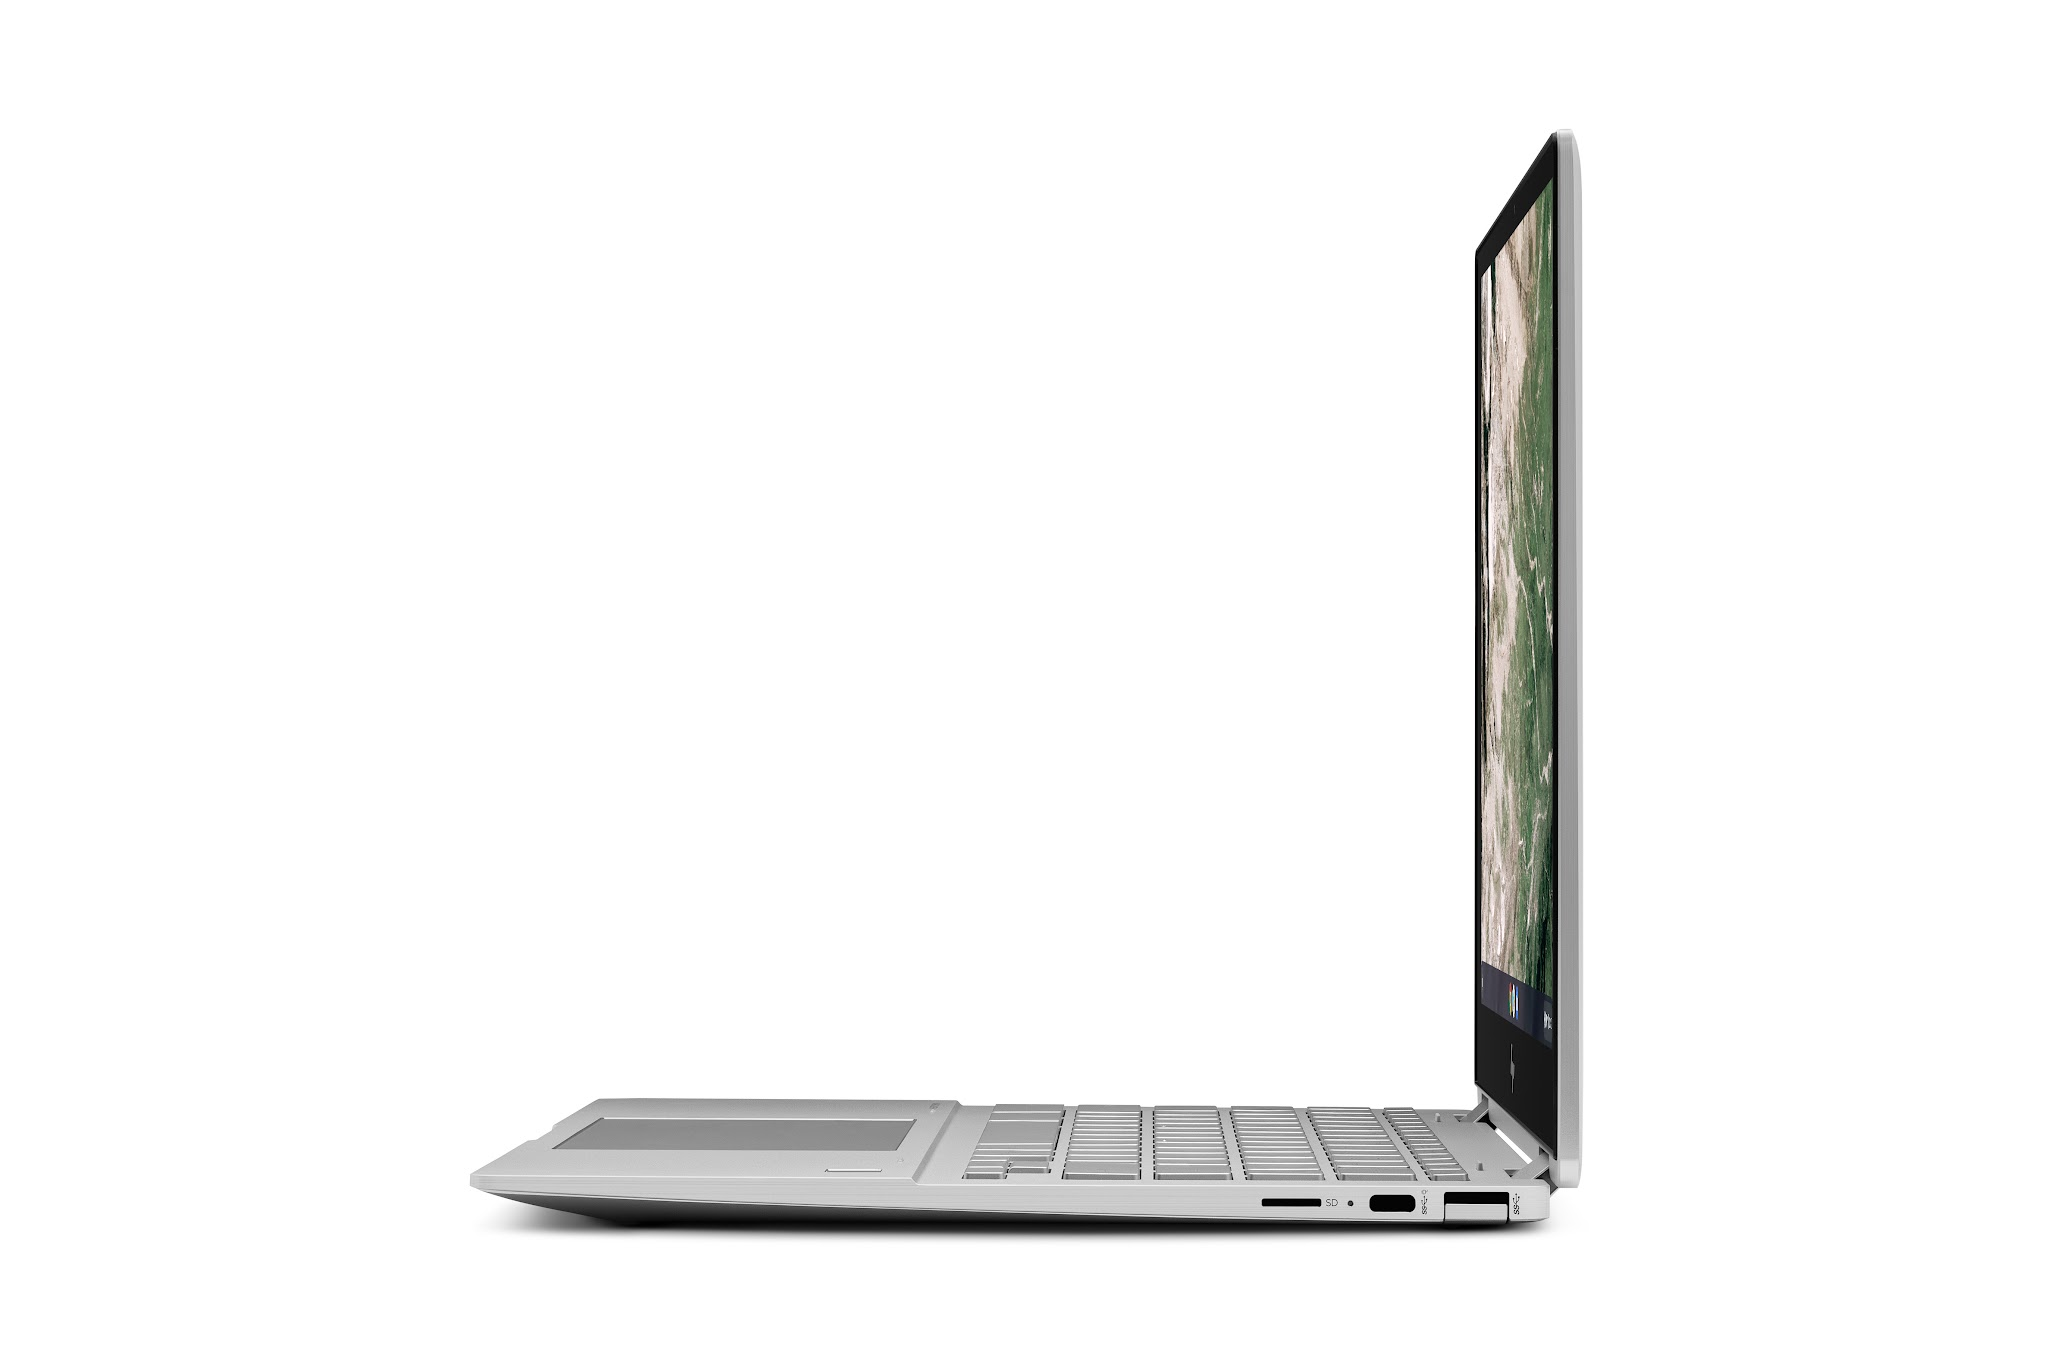 HP Chromebook x360 13c - photo 4